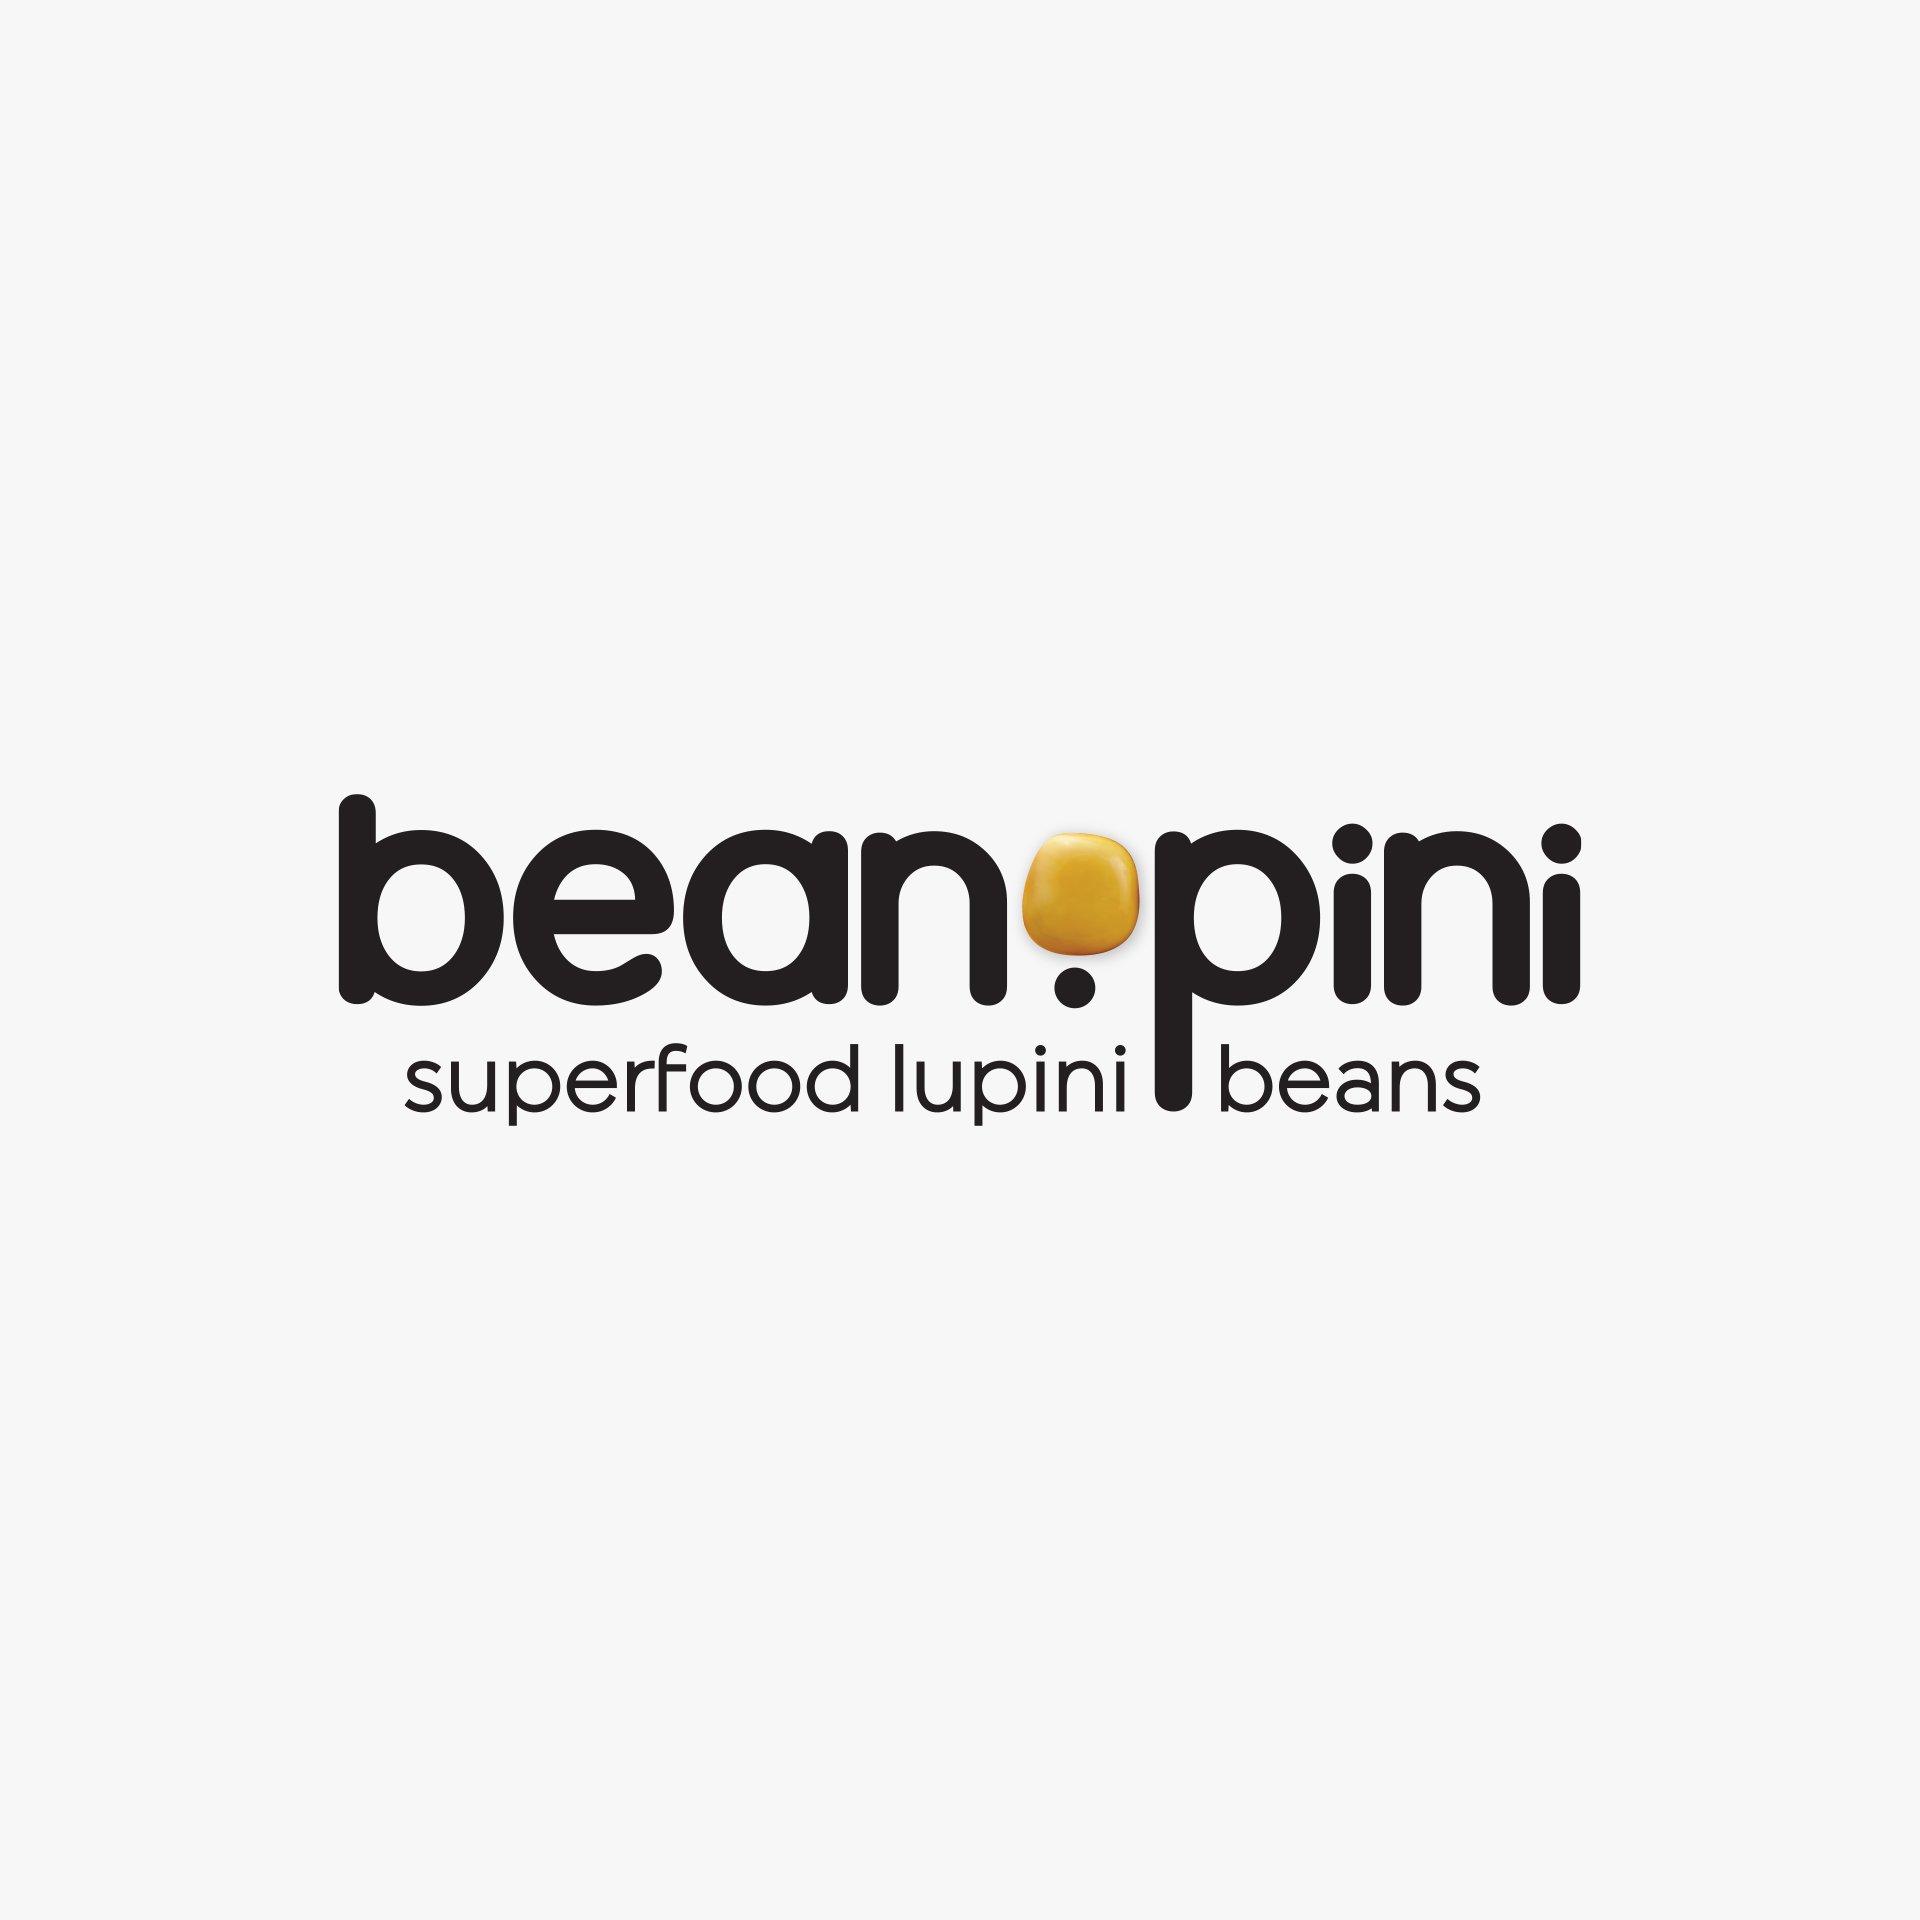 superfood packaging design Beanopini logo